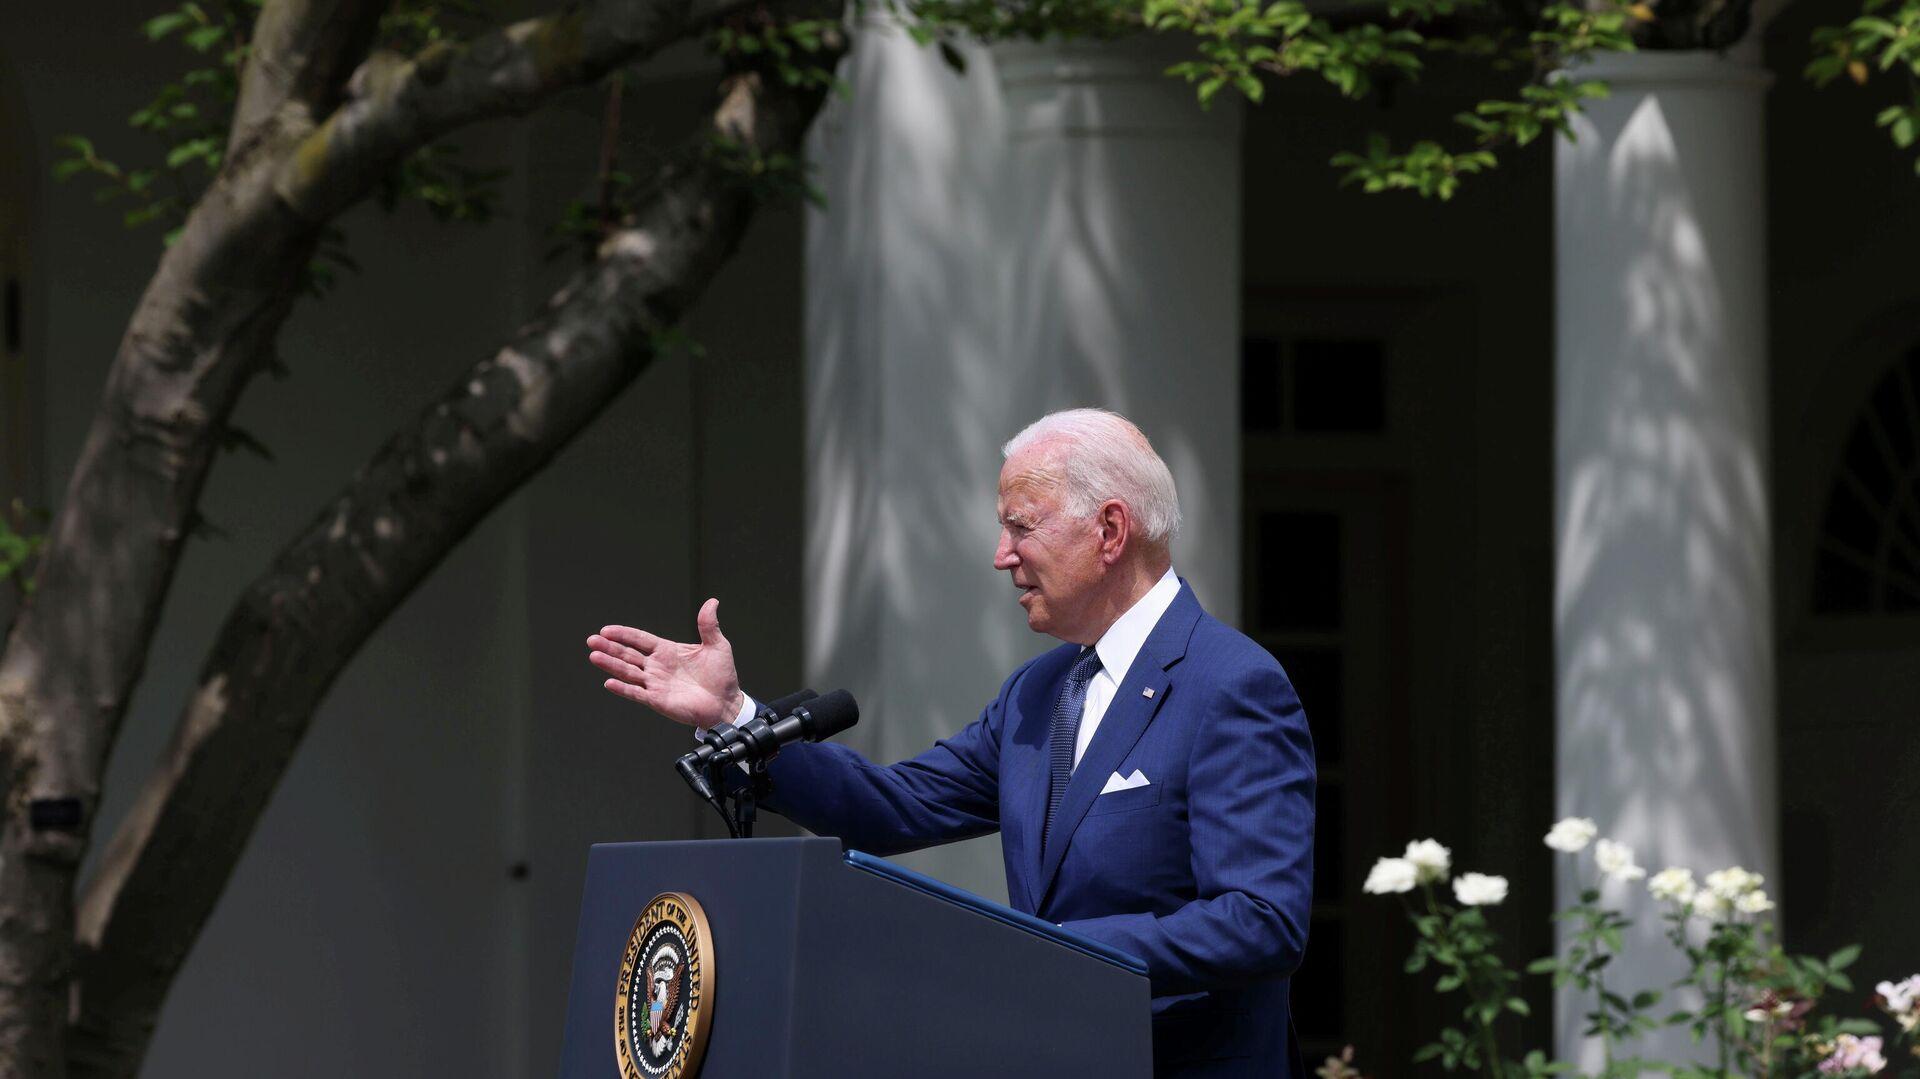 Joe Biden, presidente de EEUU - Sputnik Mundo, 1920, 27.07.2021